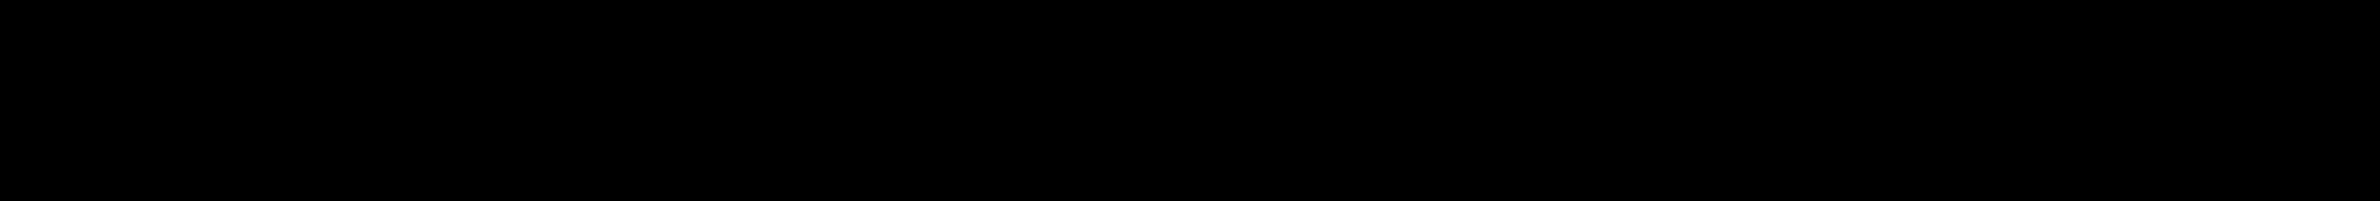 Solomon Sans Light Italic